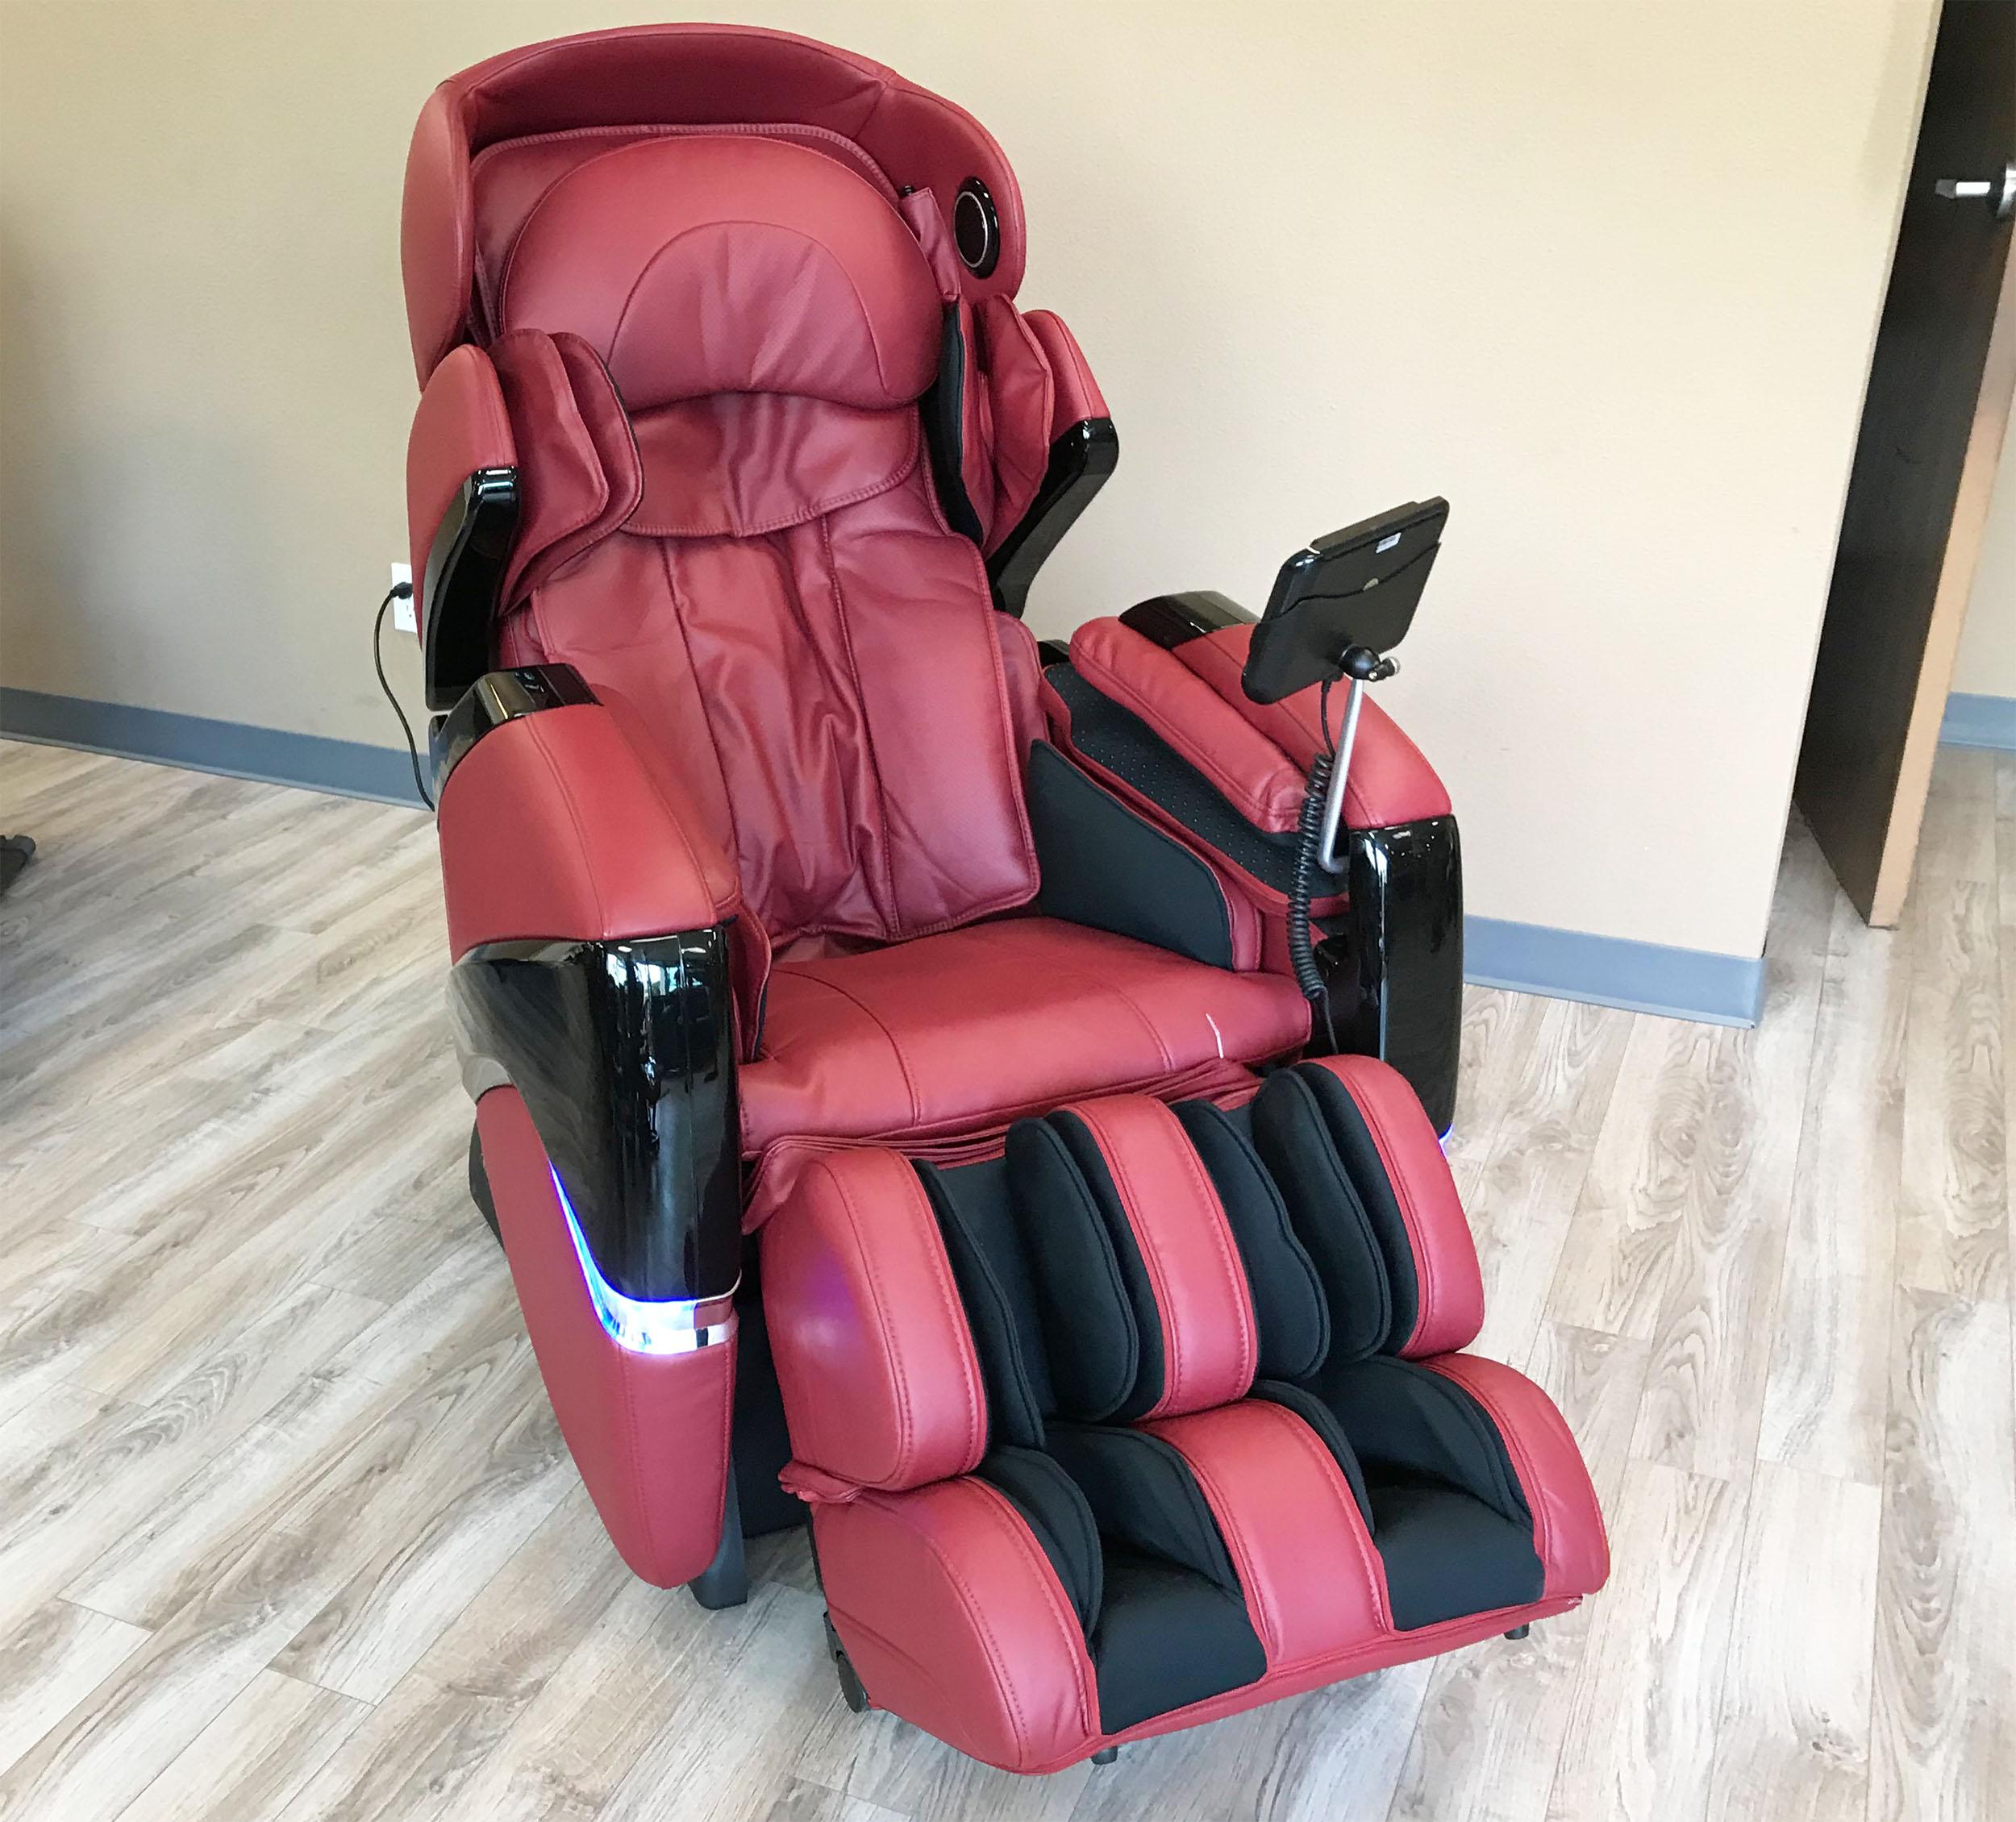 osaki os 3d cyber pro massage chair folding rocker zero gravity recliner and